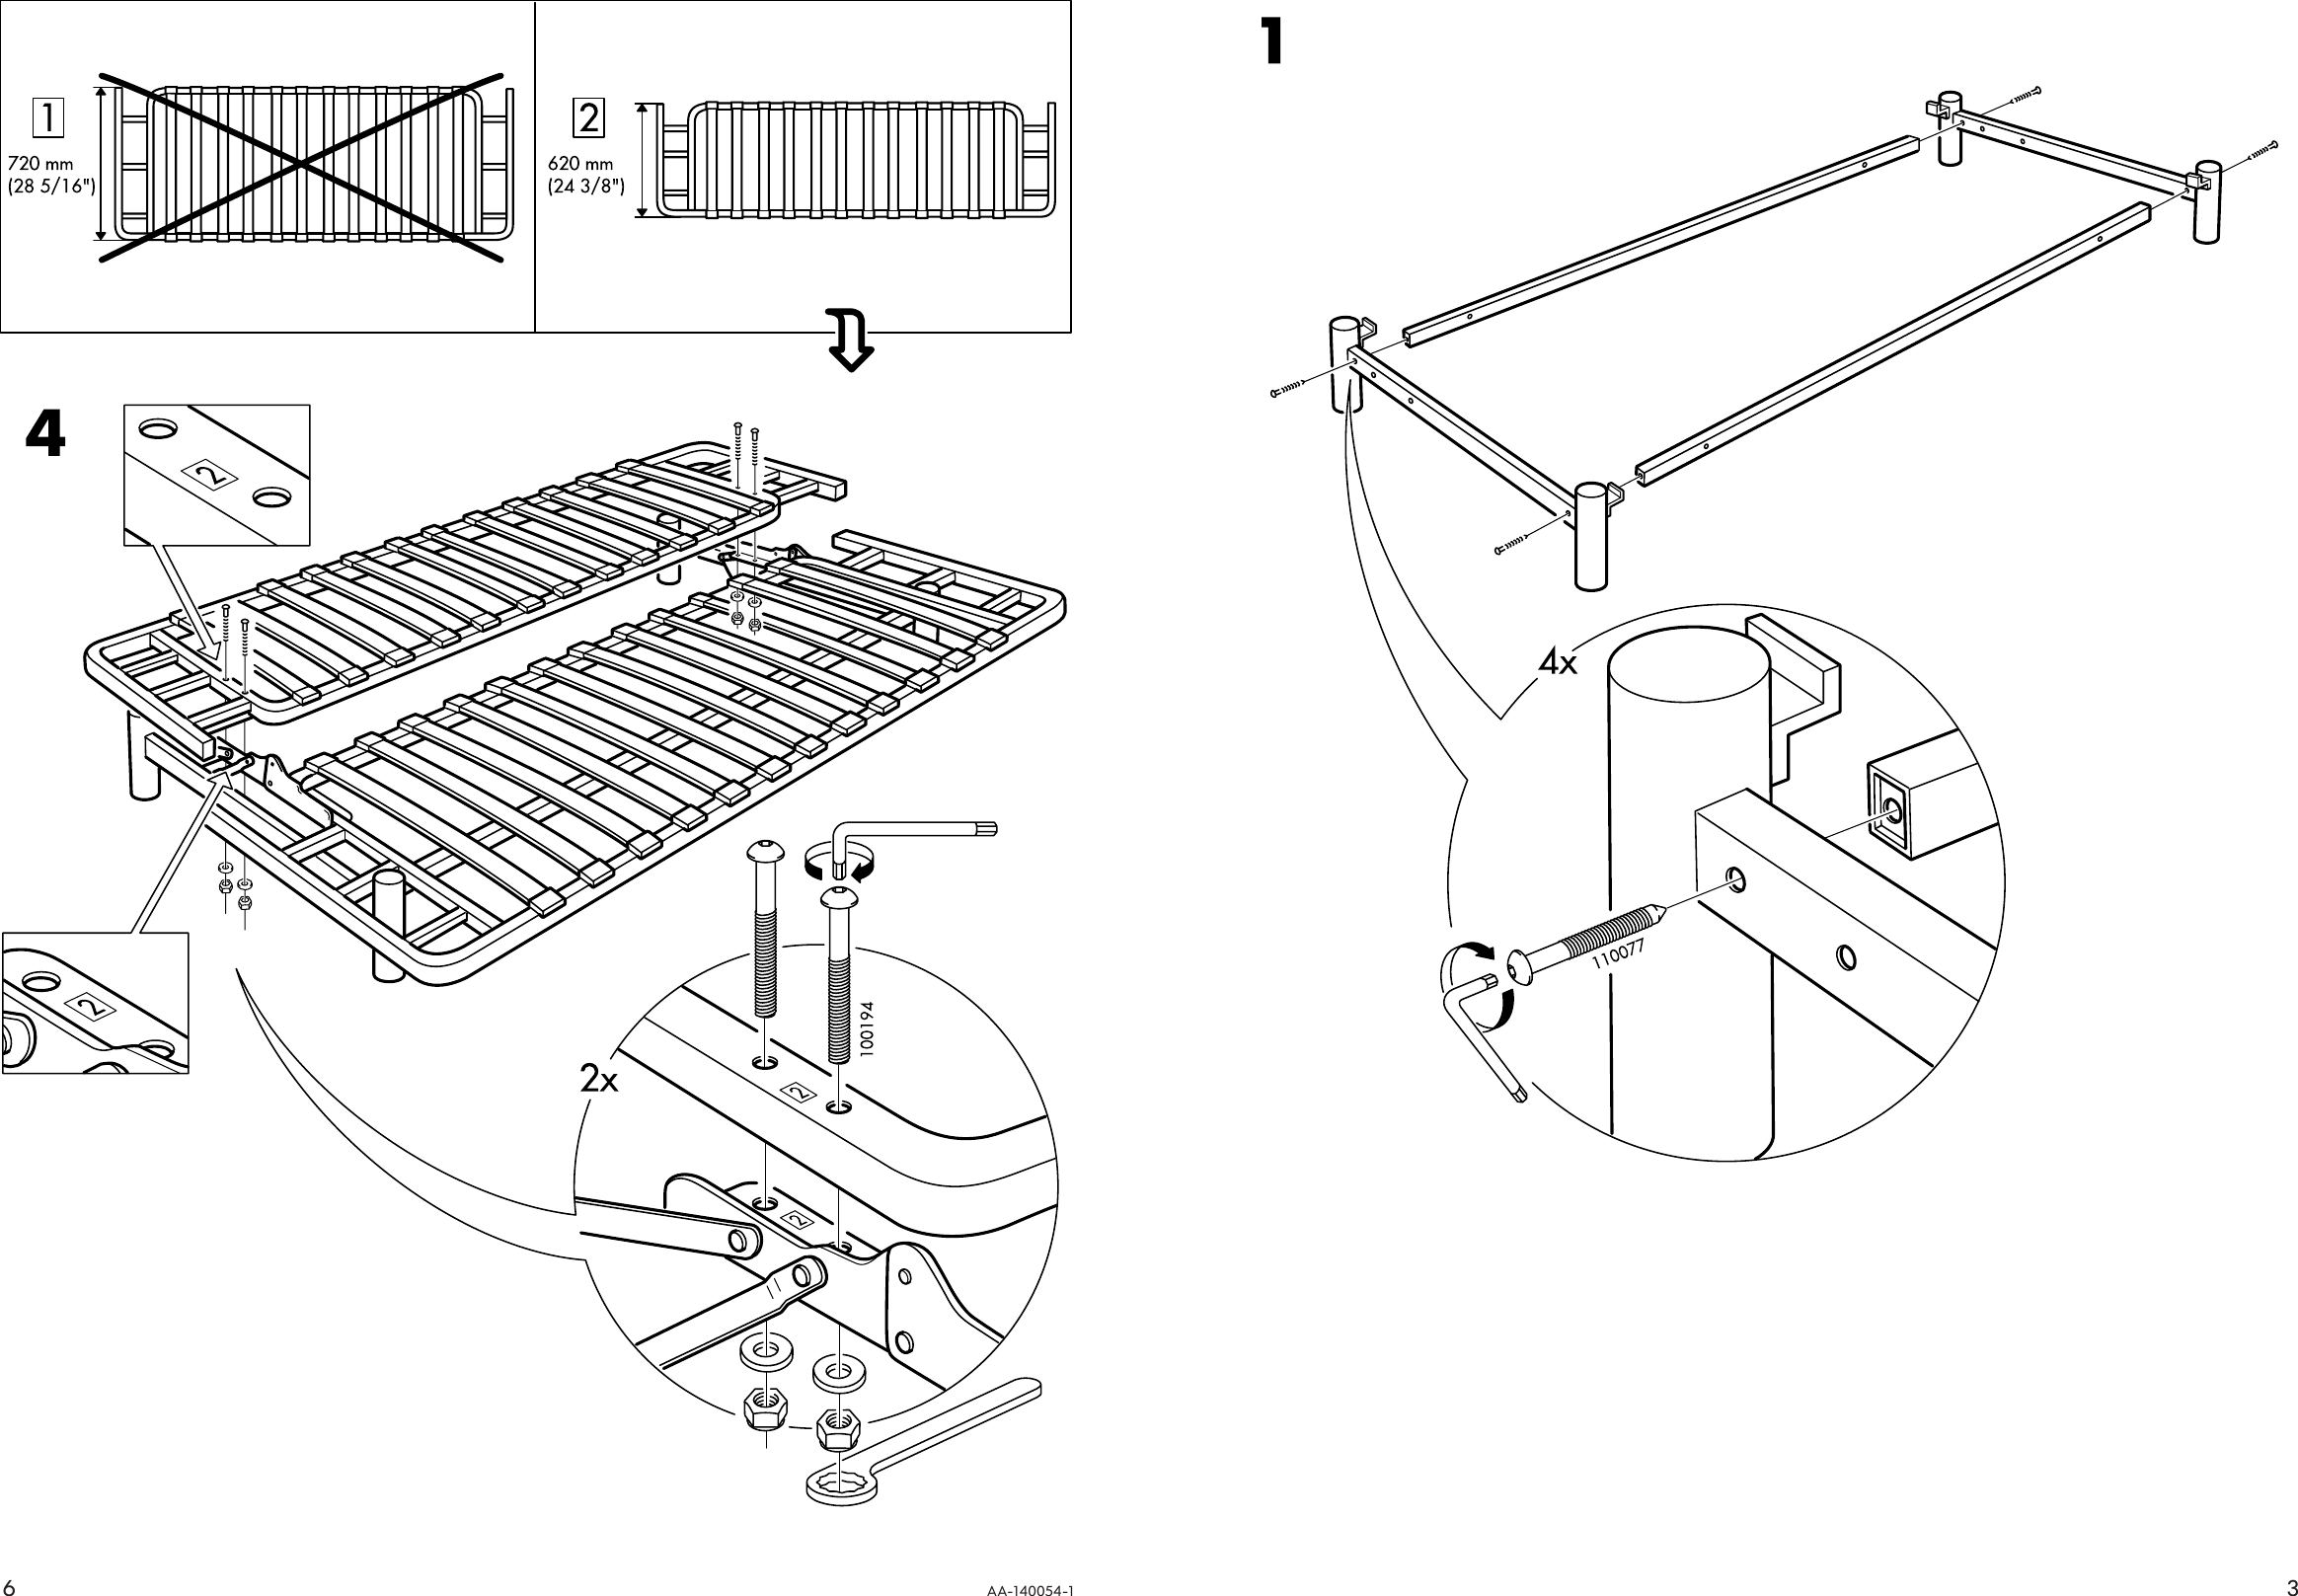 Ikea Beddinge Sofabed Frame Assembly Instruction 2